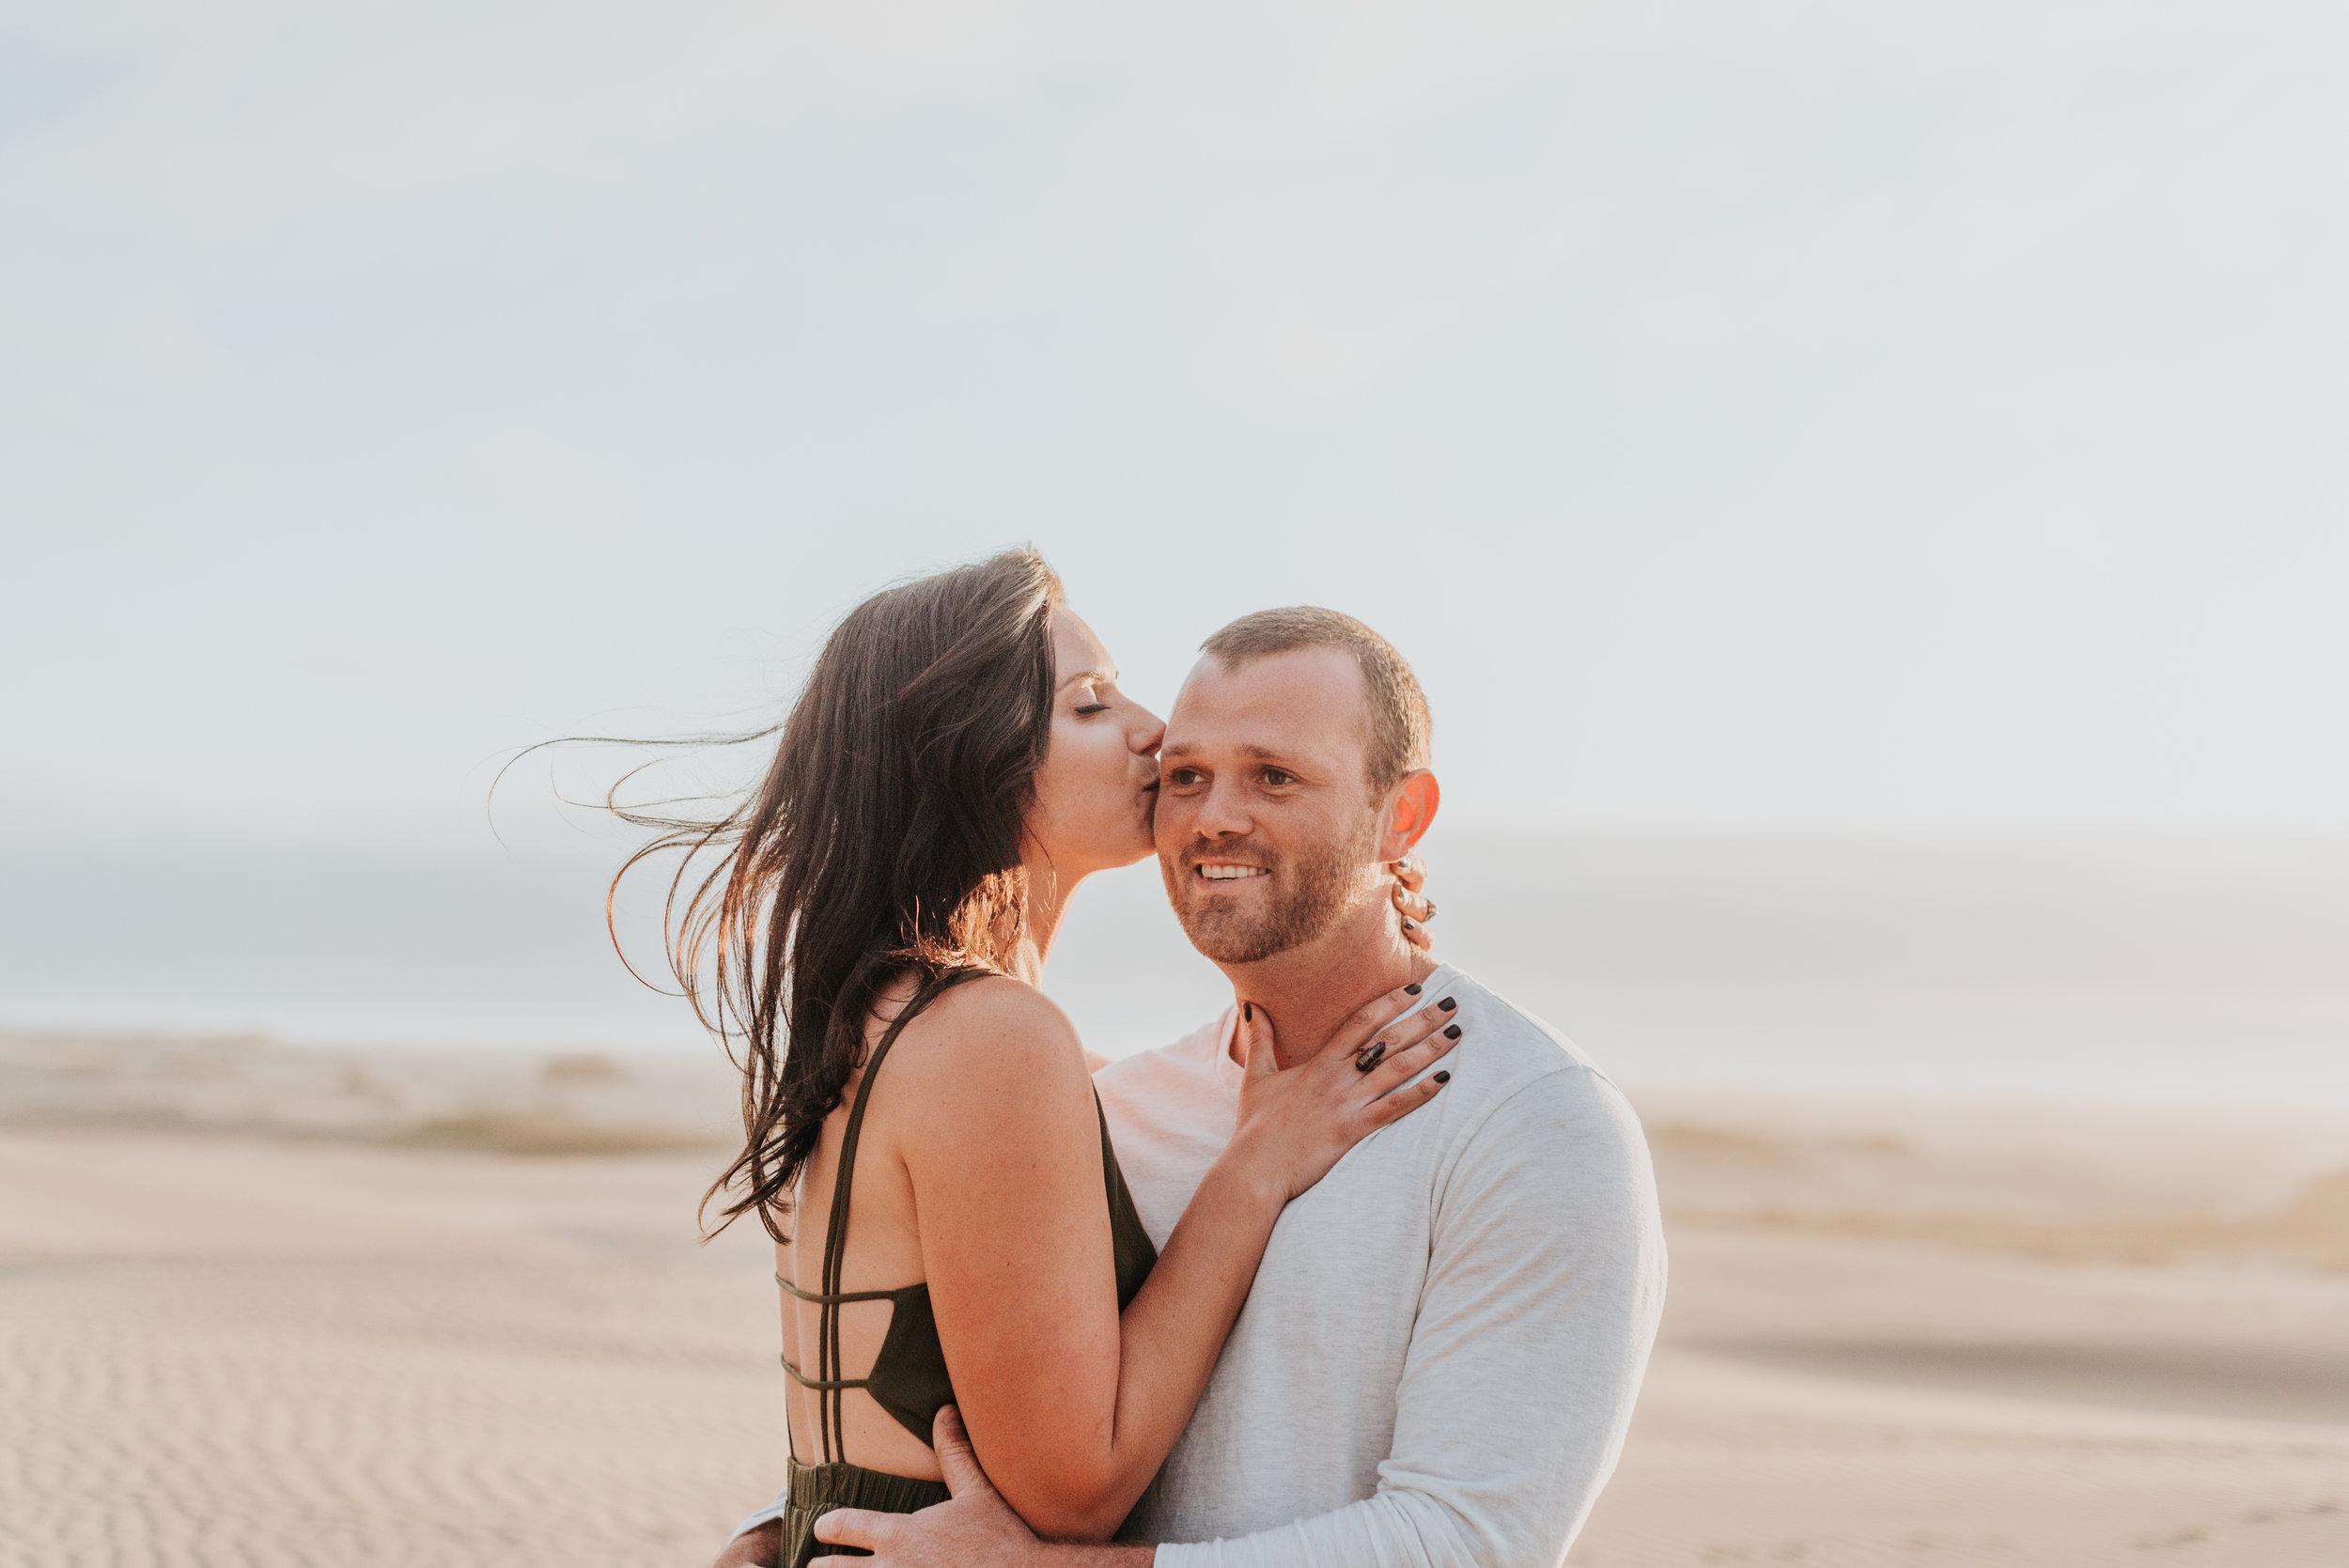 mendocino couples photographer